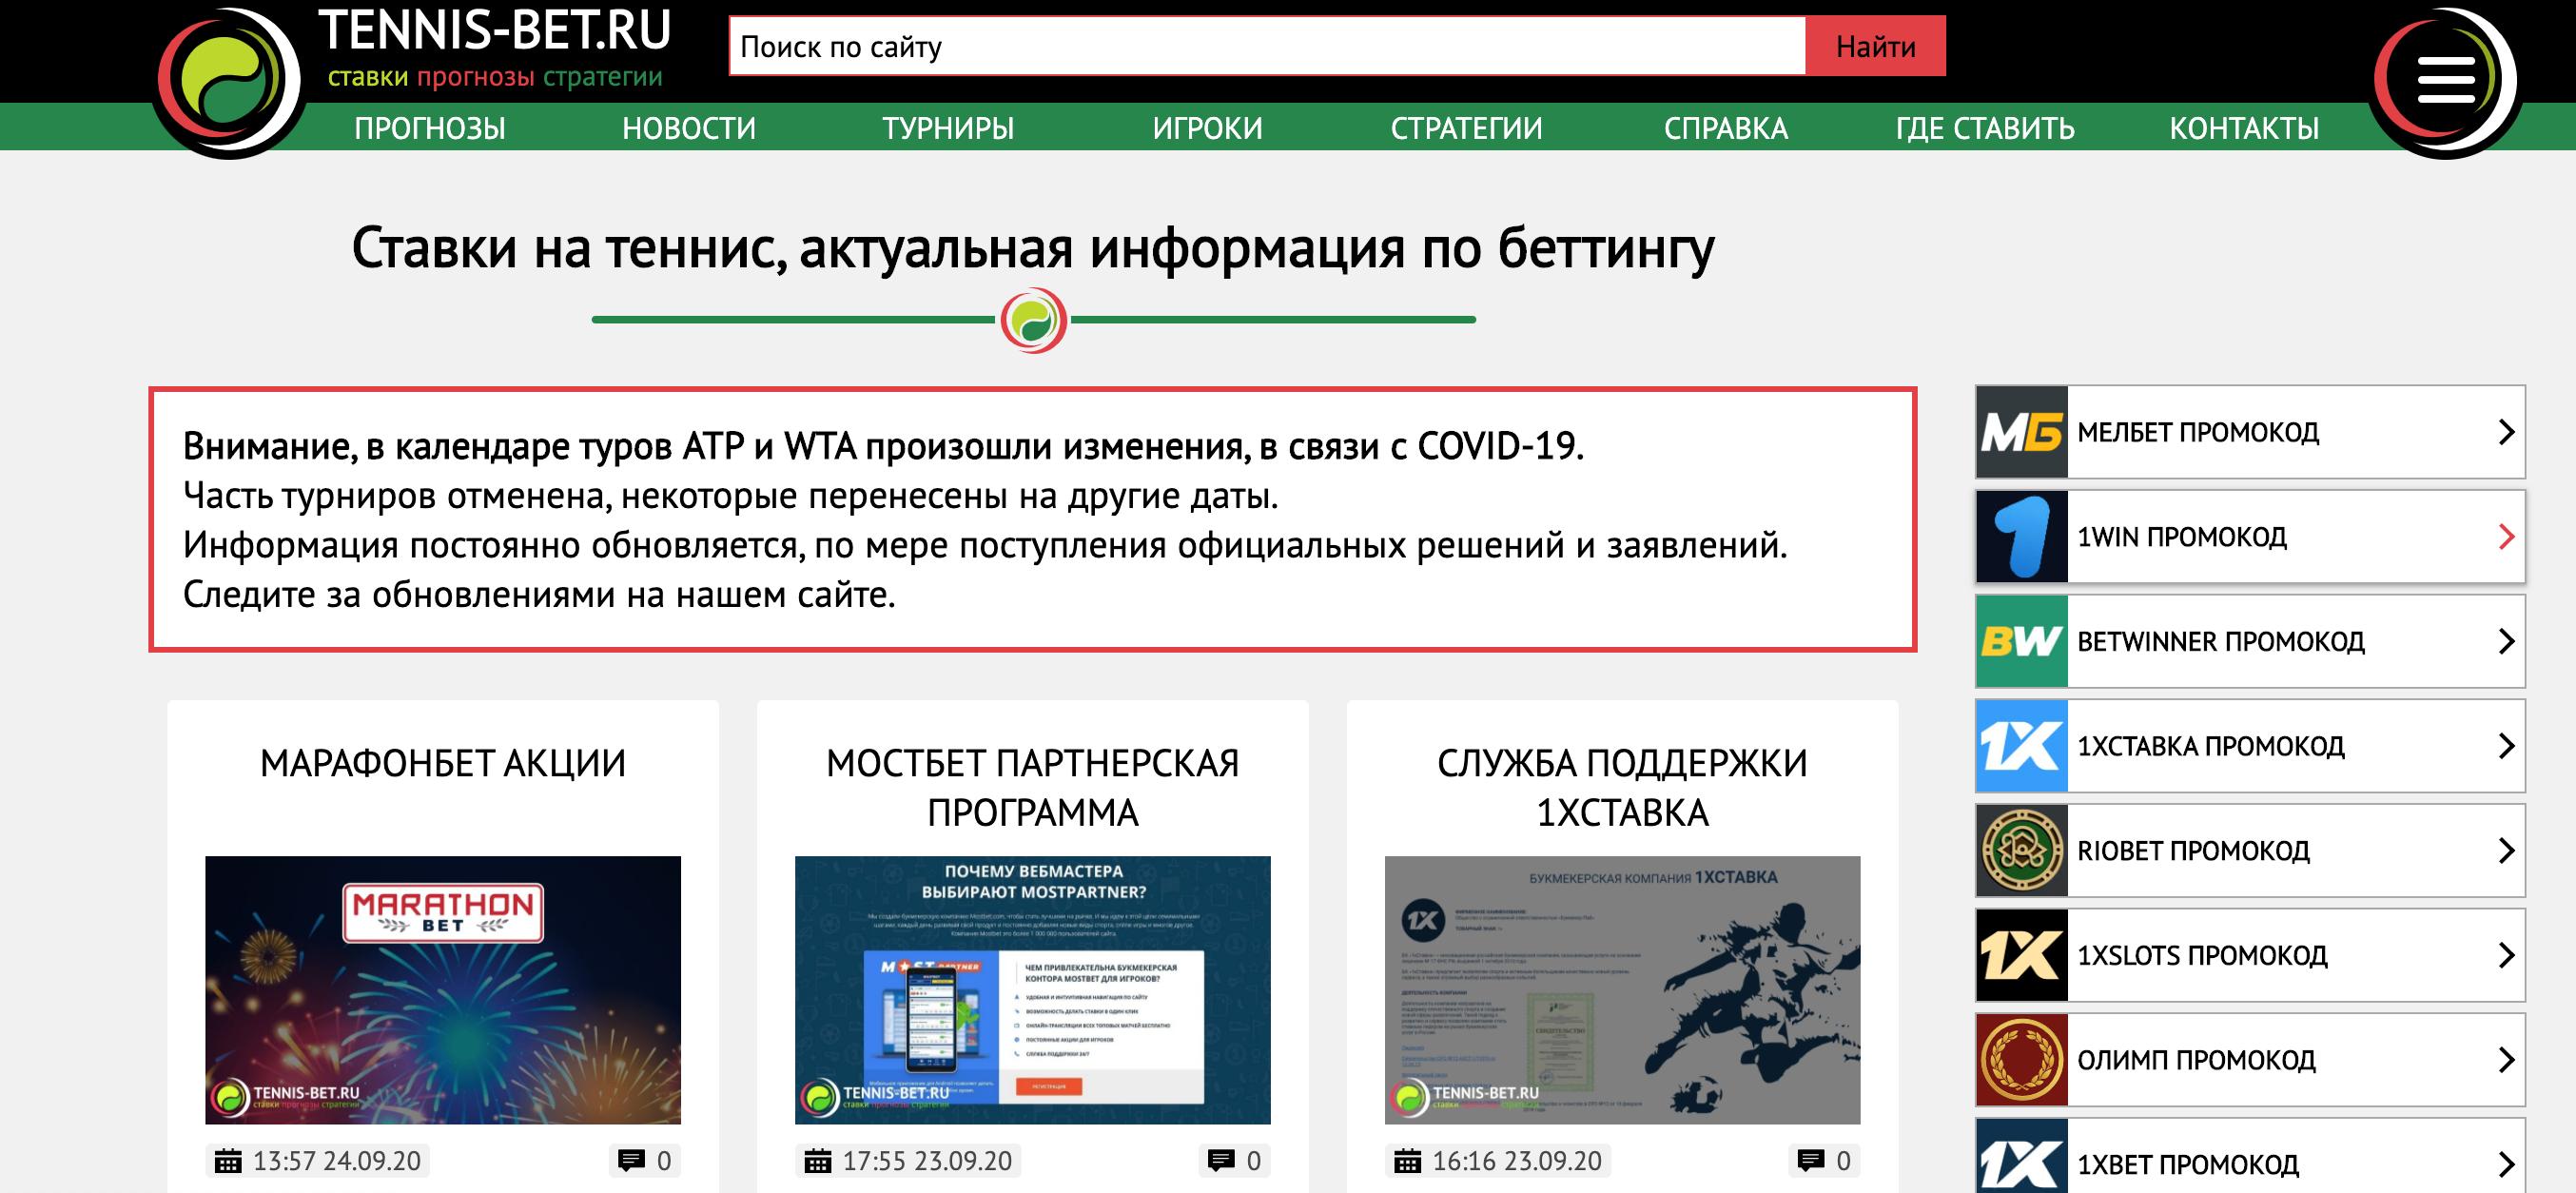 Страница сайта Tennis-bet.ru